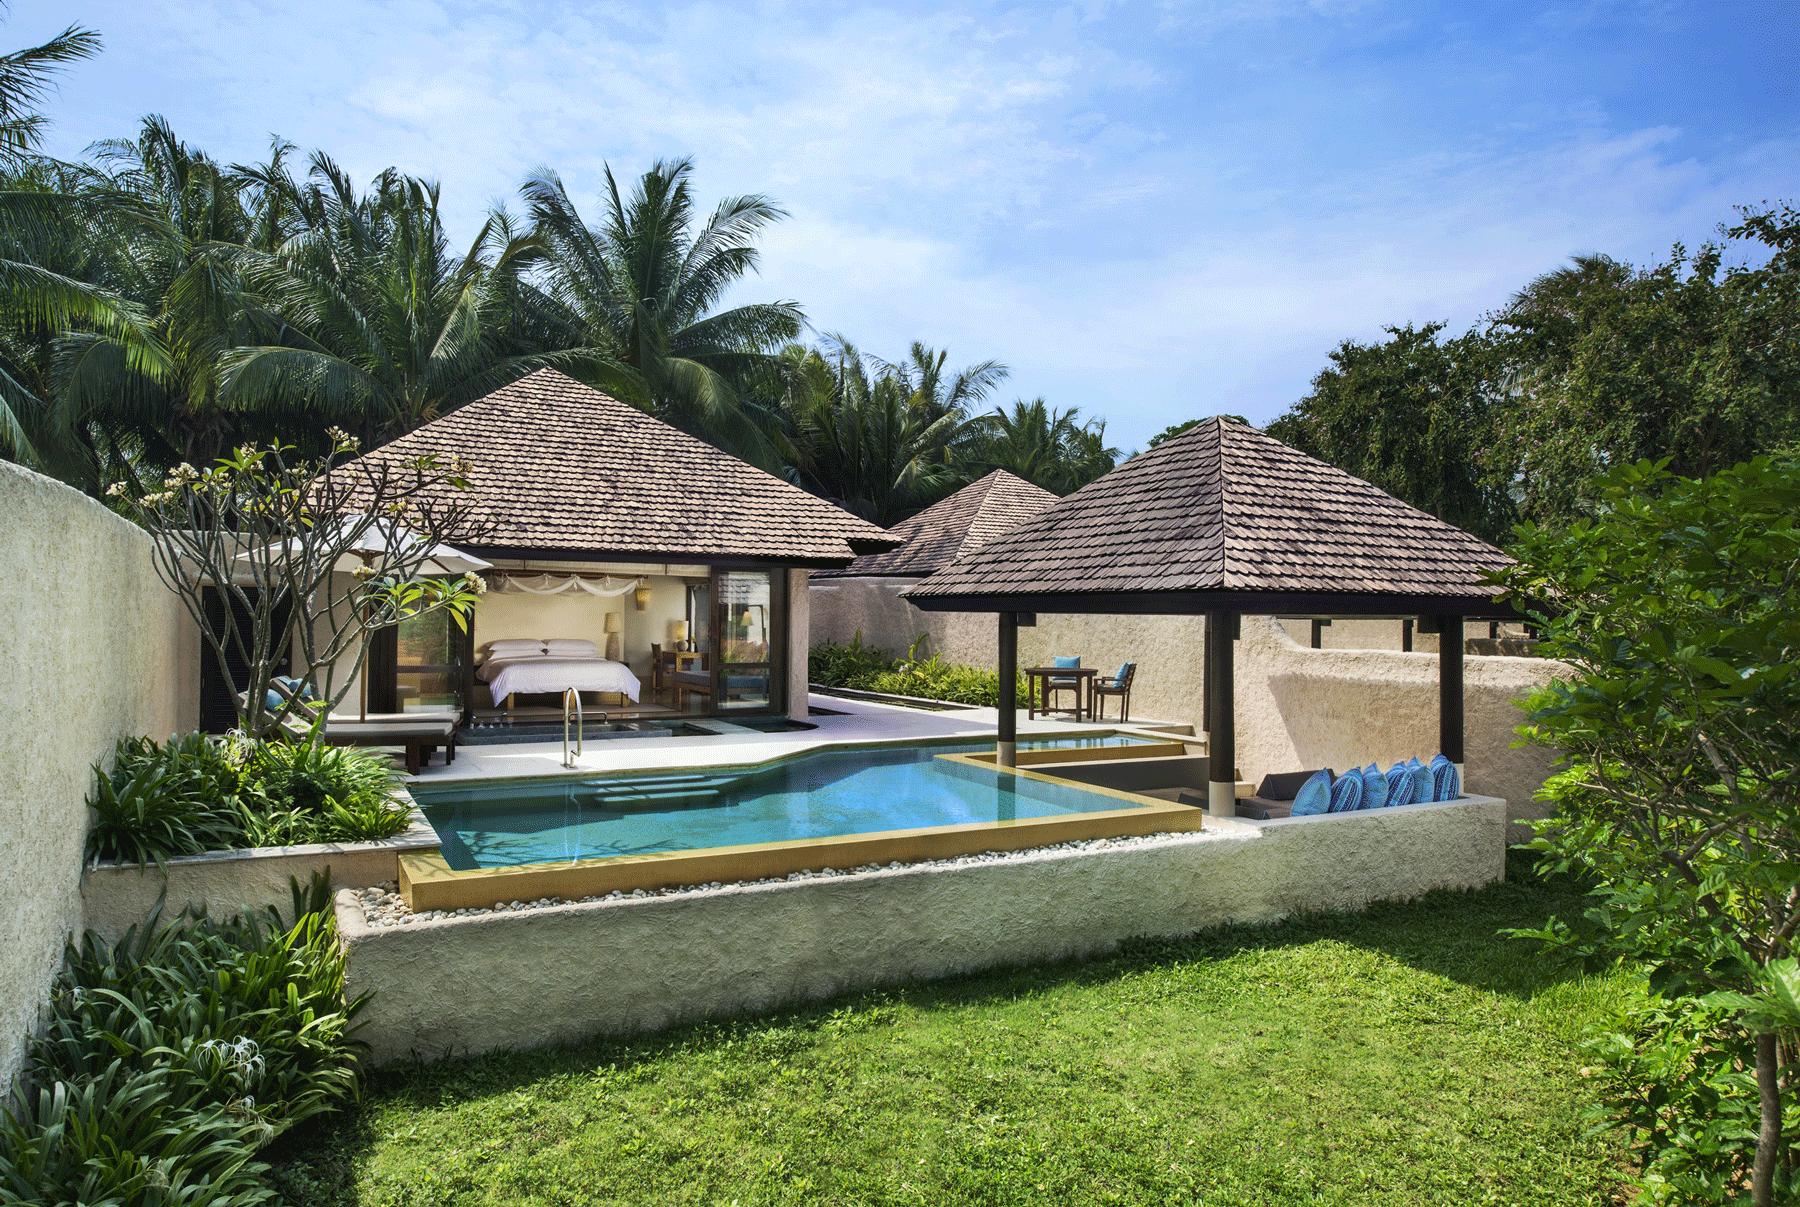 Pool-Villa-Exterior-Overview.png